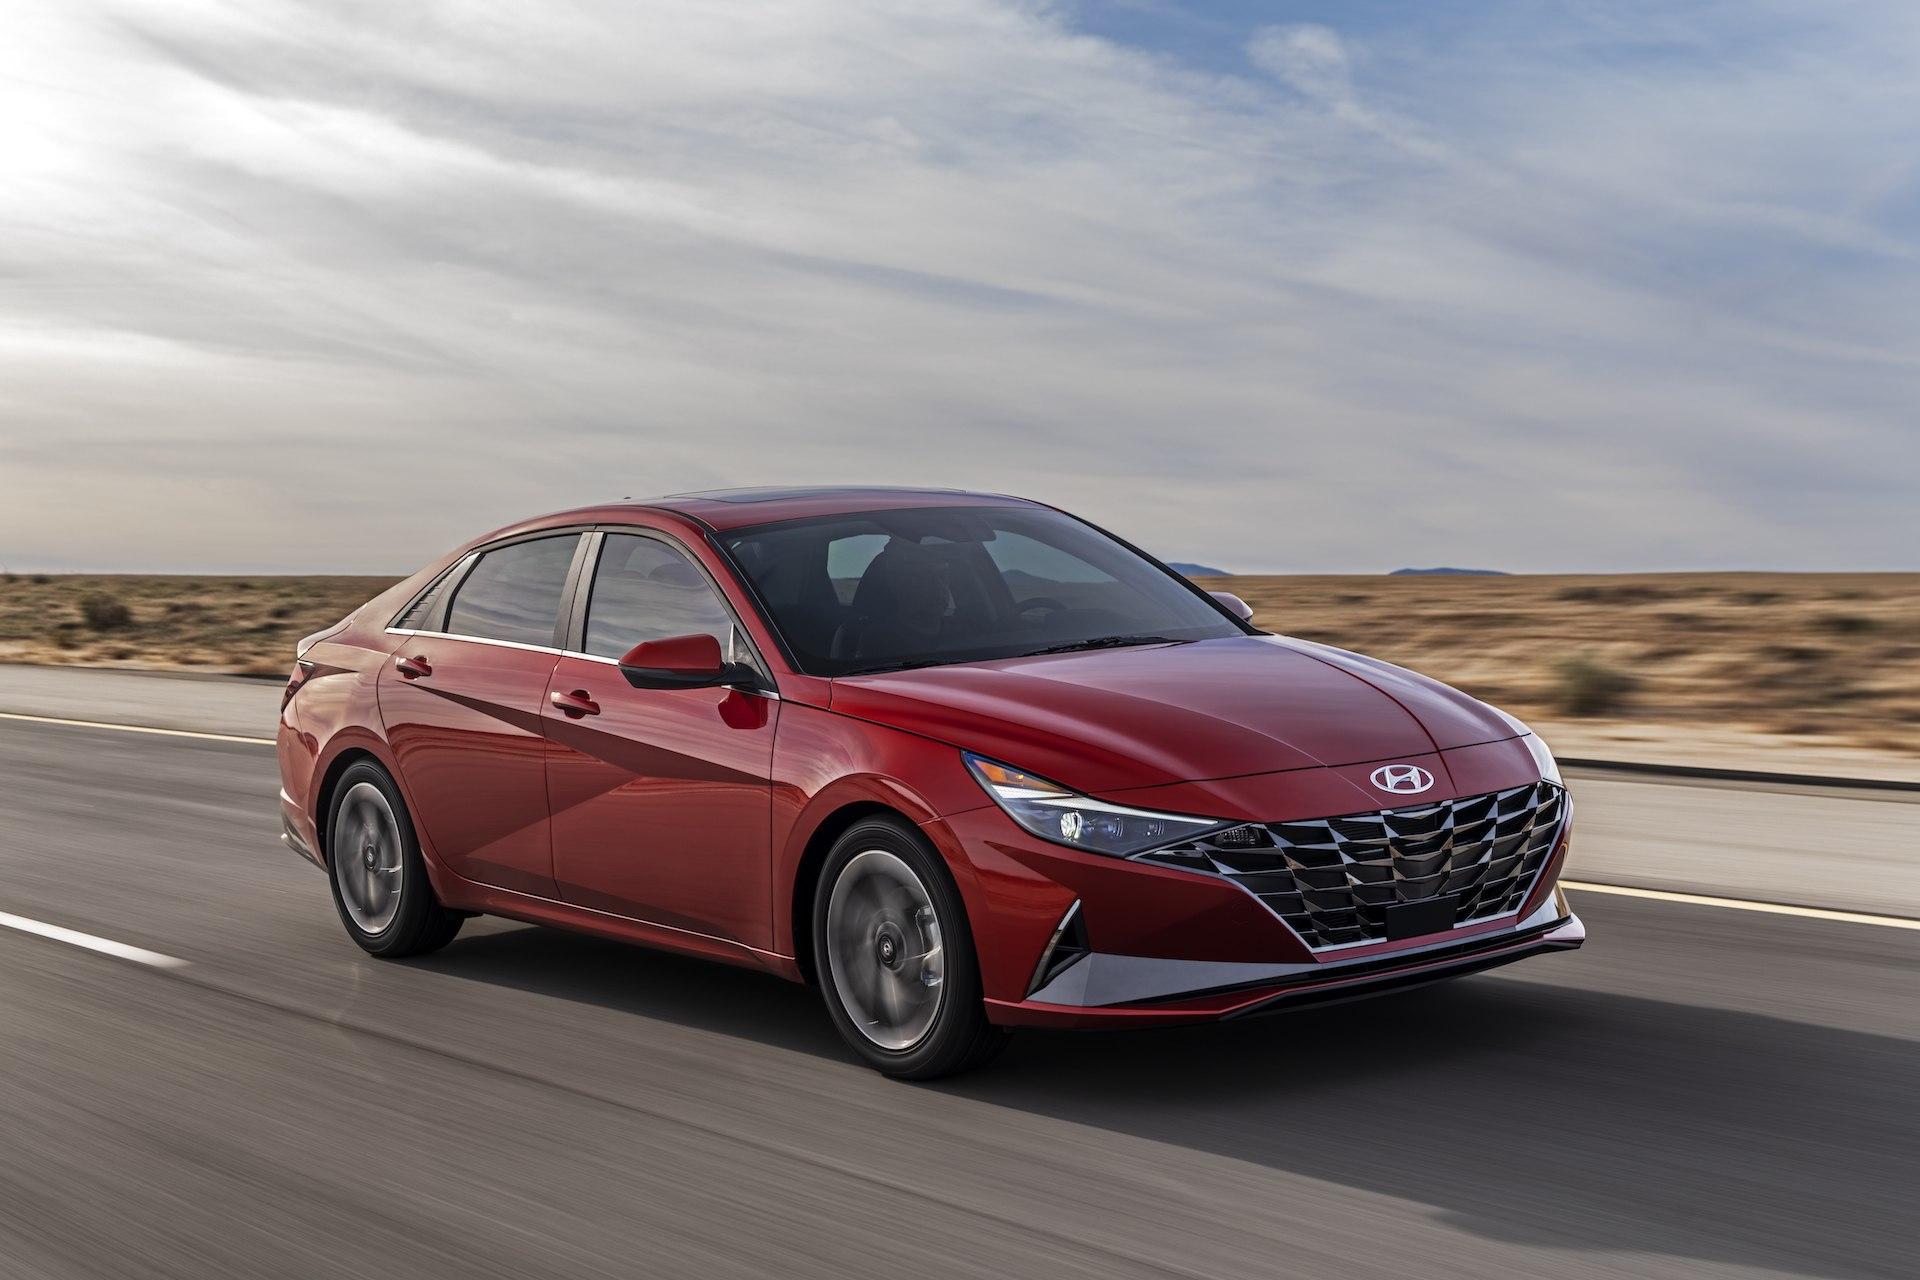 New Model and Performance Hyundai Avante Sport 2021